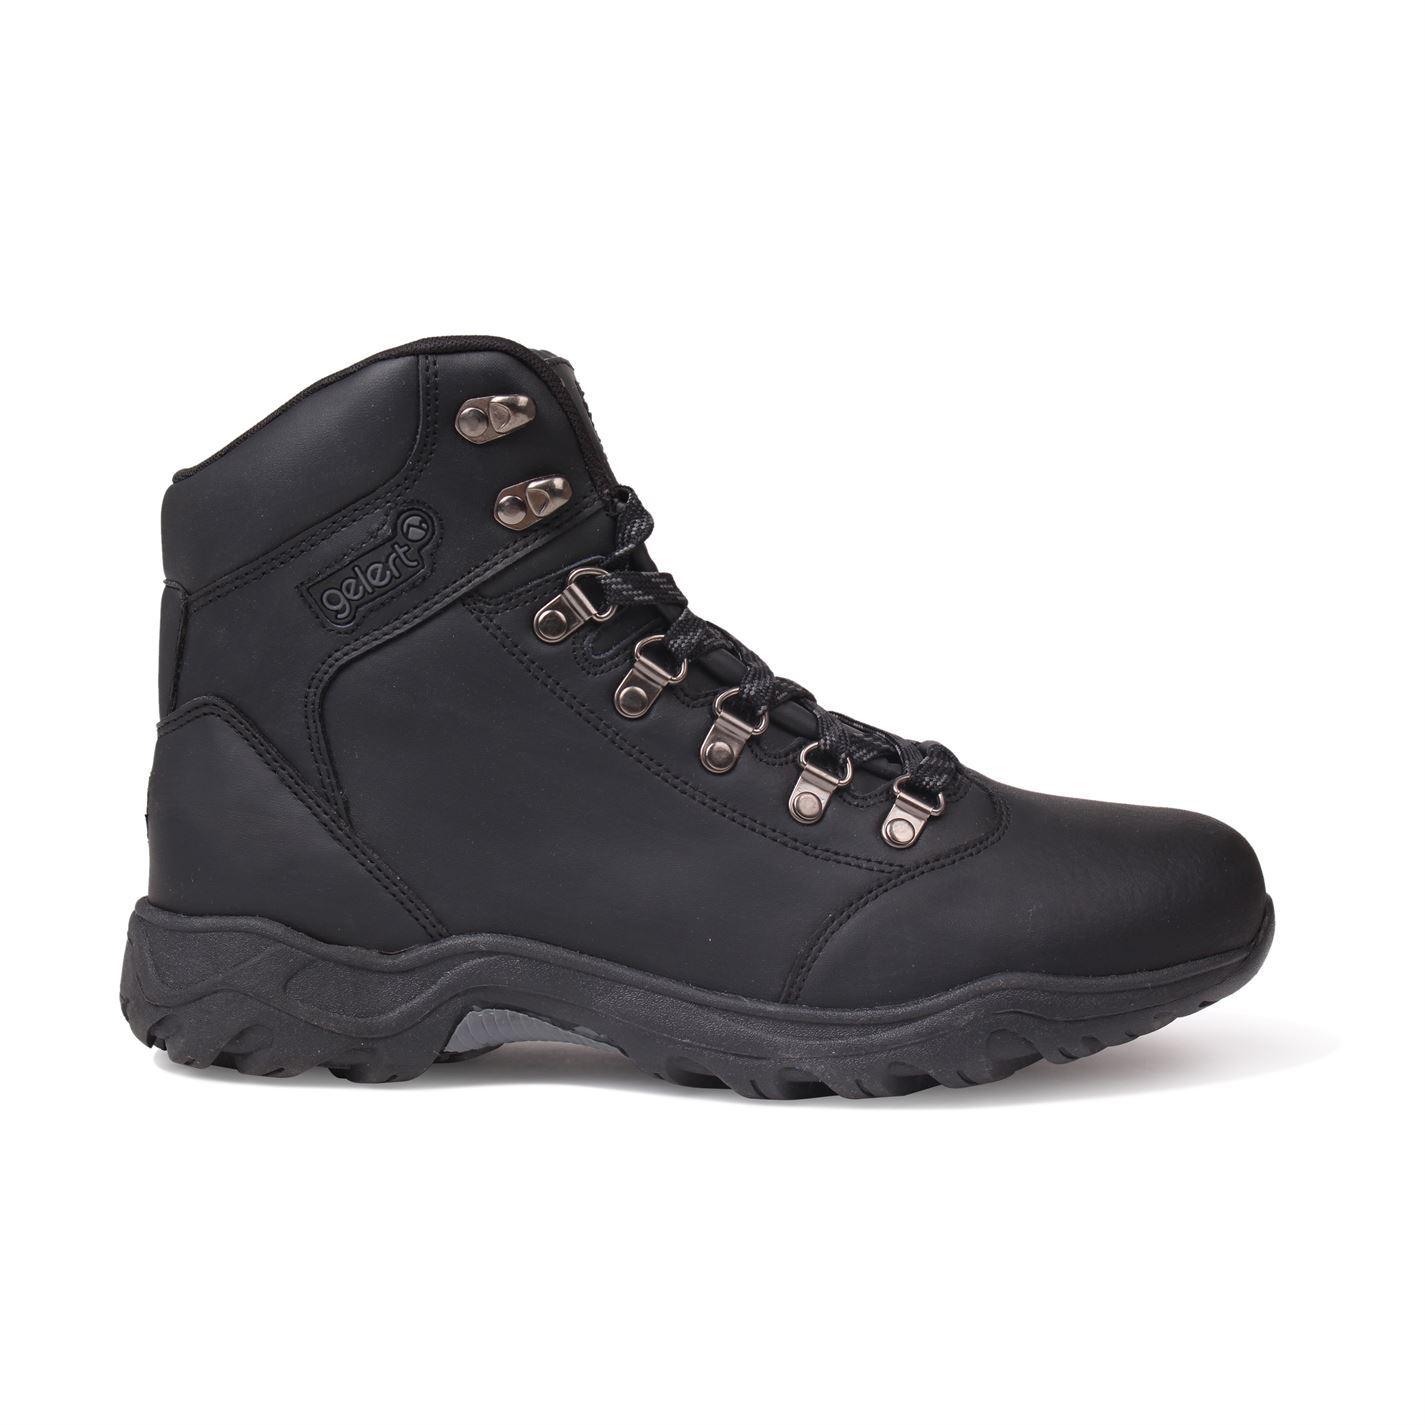 Gelert Gelert Gelert Leder Walking Stiefel  Herren Hiking Trekking Schuhes Footwear bba656